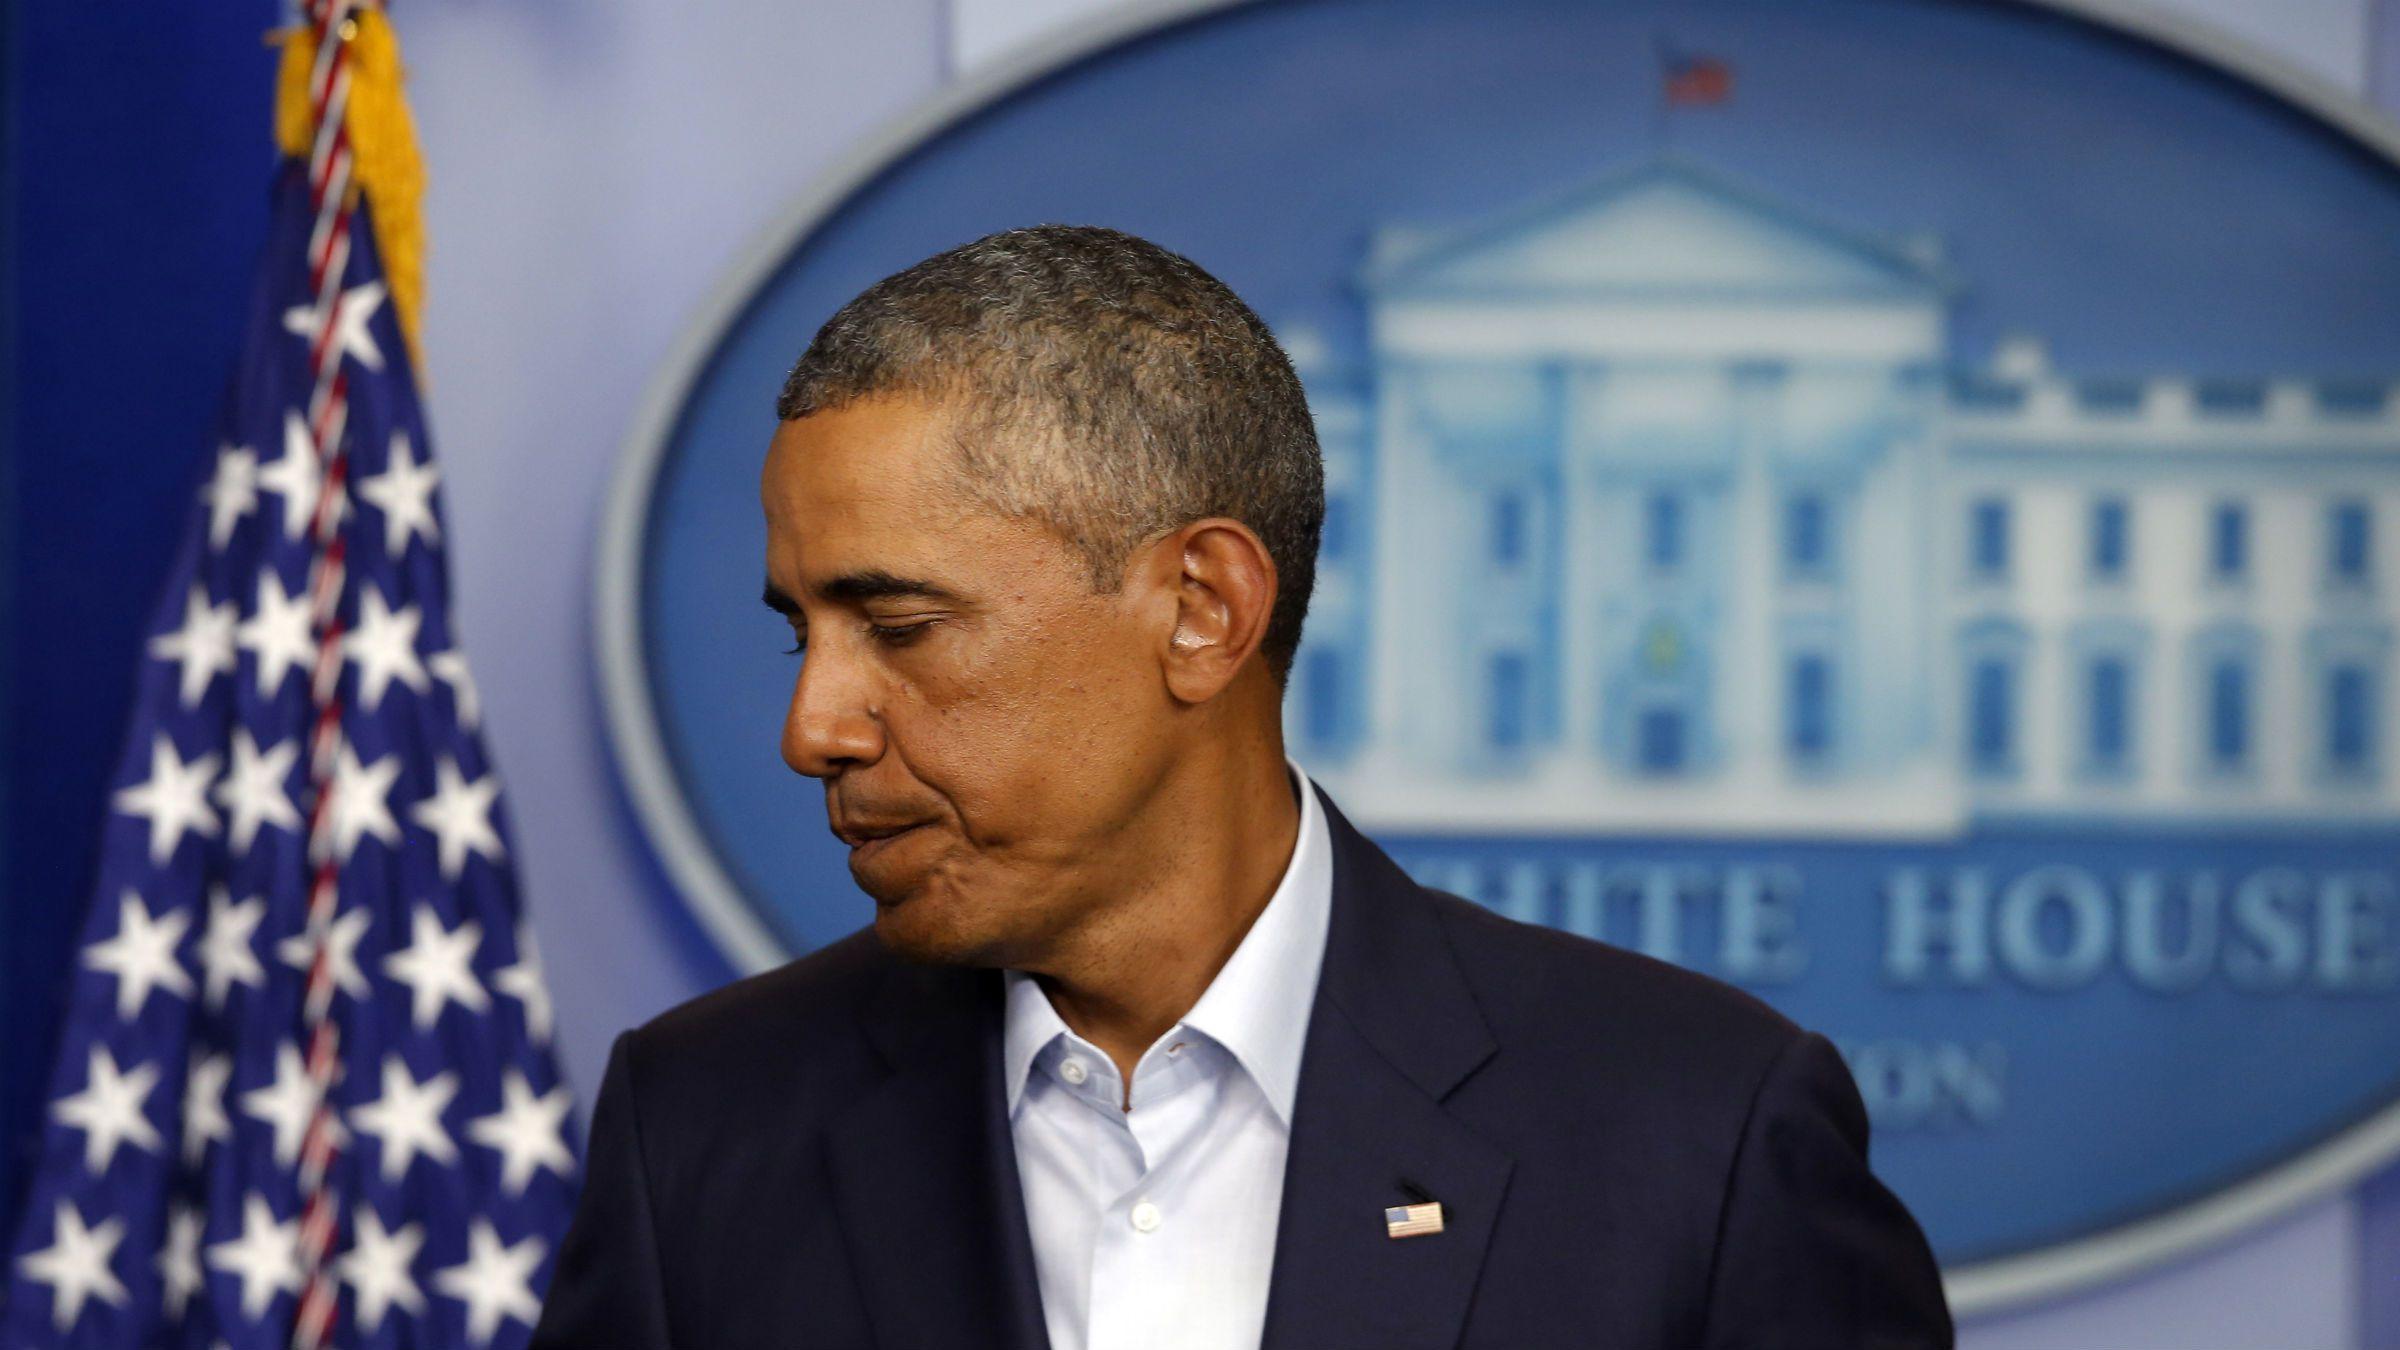 Barack Obama talk about Ferguson